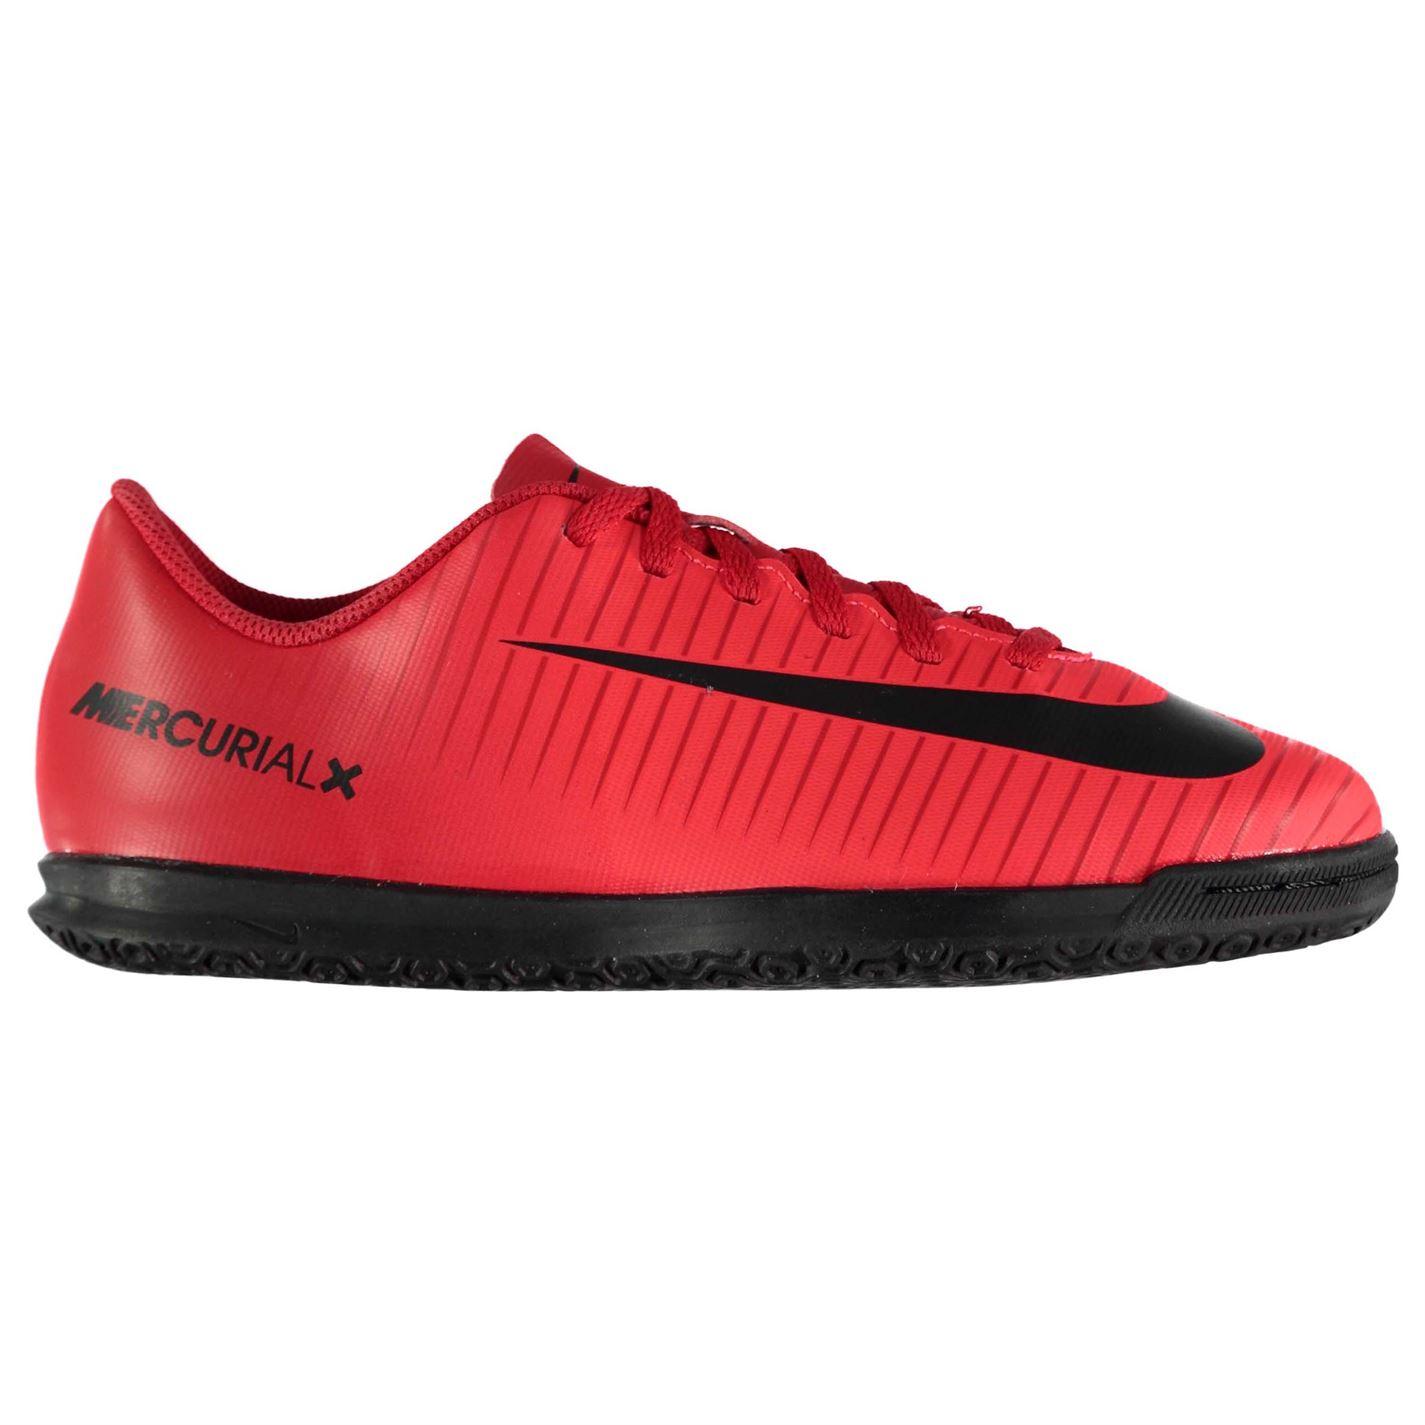 Nike Mercurial Vortex Junior Indoor Football Trainers